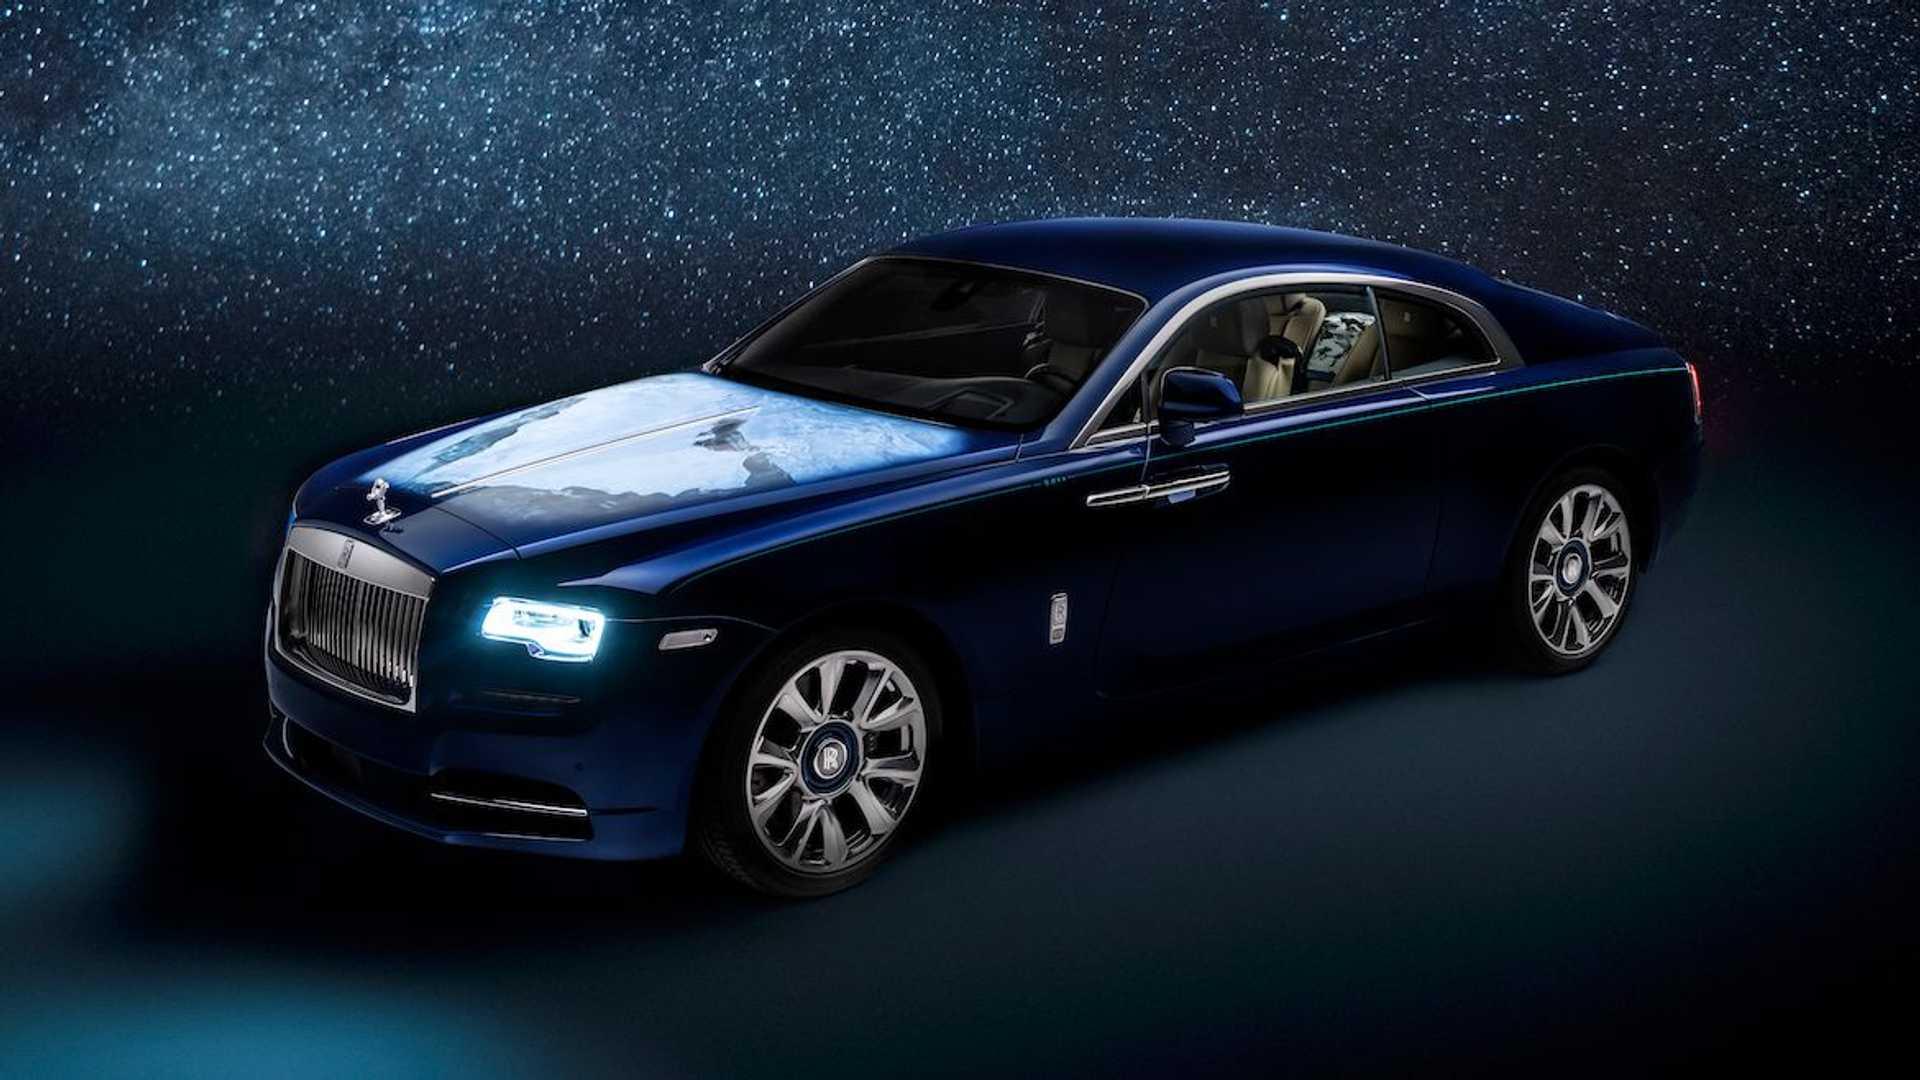 Rolls-Royce以中東為景、太陽系為靈感打造出了「Wraith─Inspired by Earth」